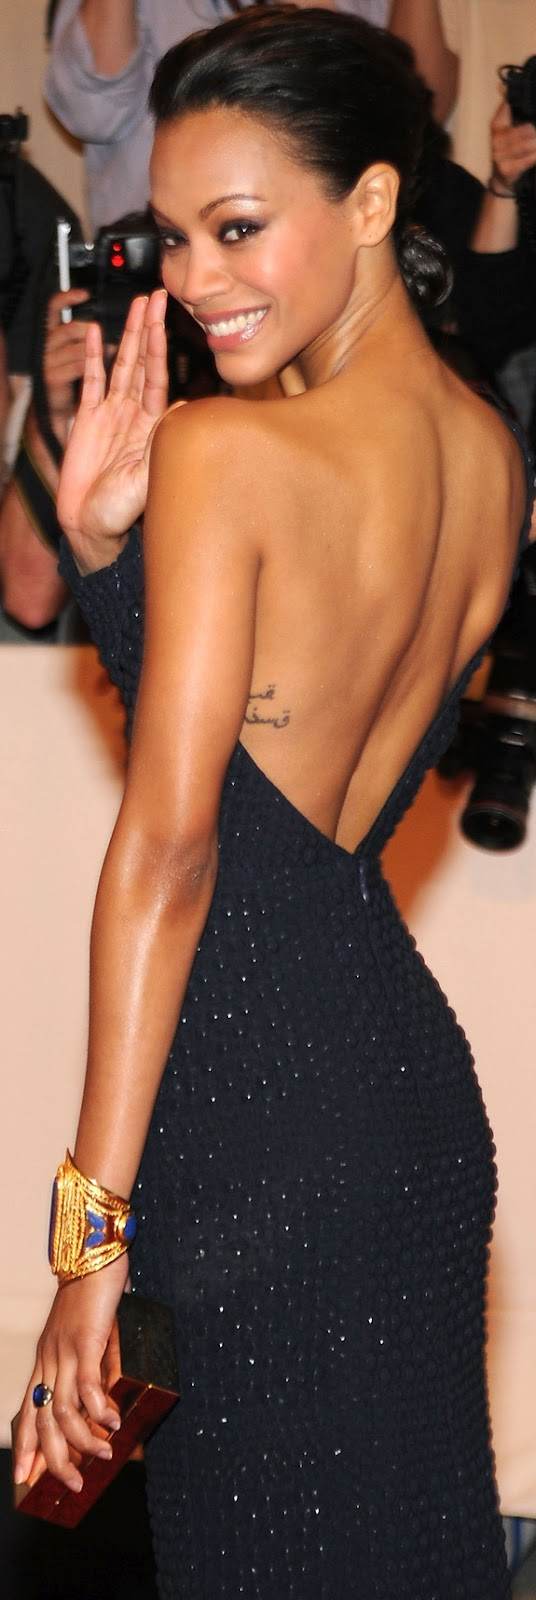 Zoe Saldana Tattoo Photojpg